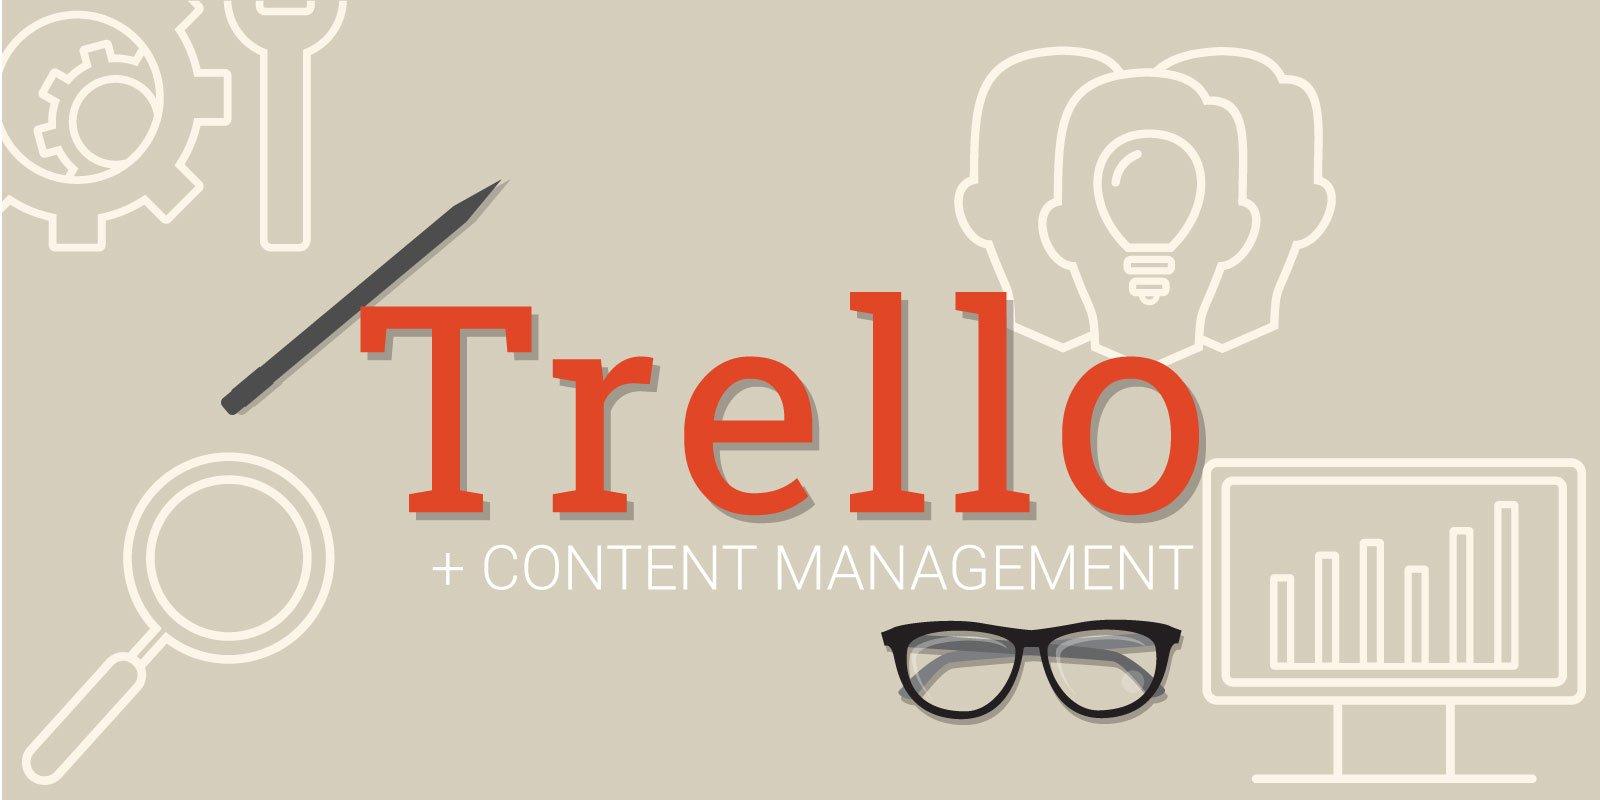 content-management-tools.jpg